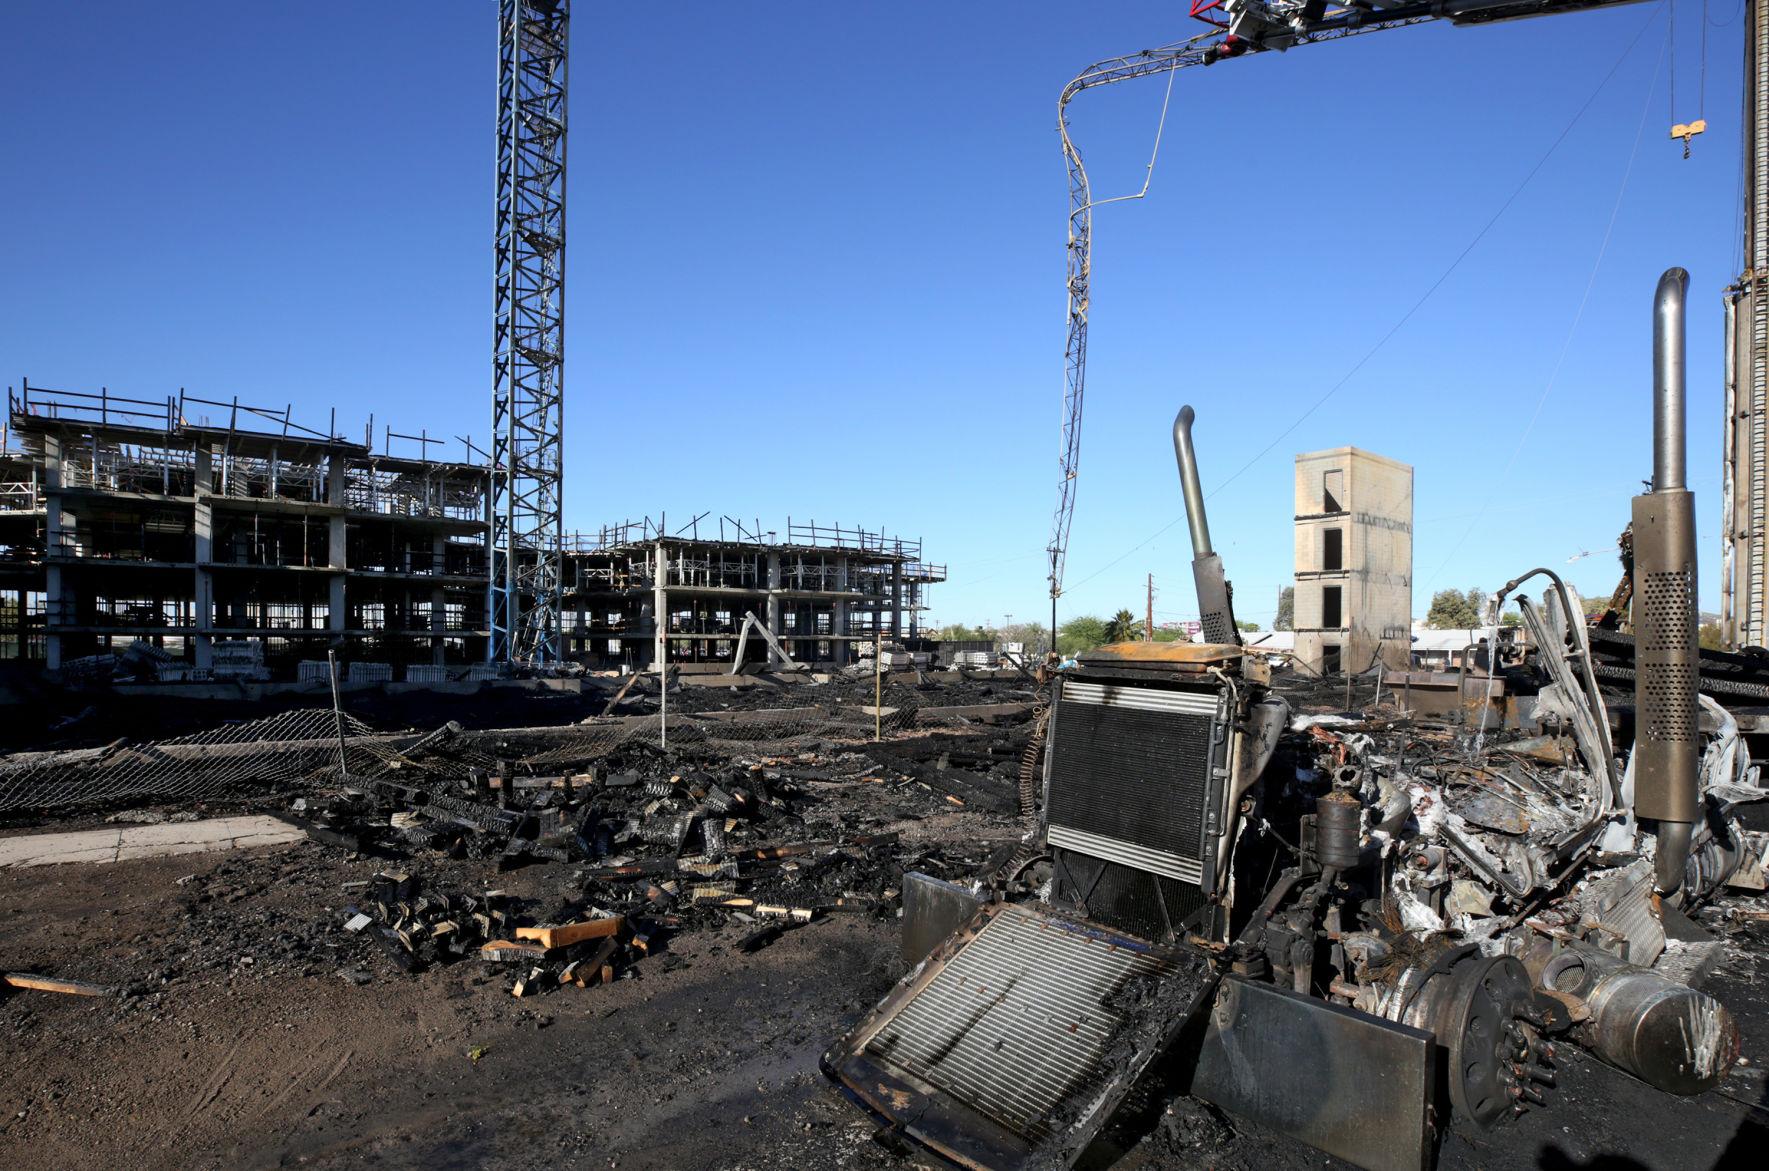 Overnight fire engulfs Tucson construction site south of UA campus | Tucson.com